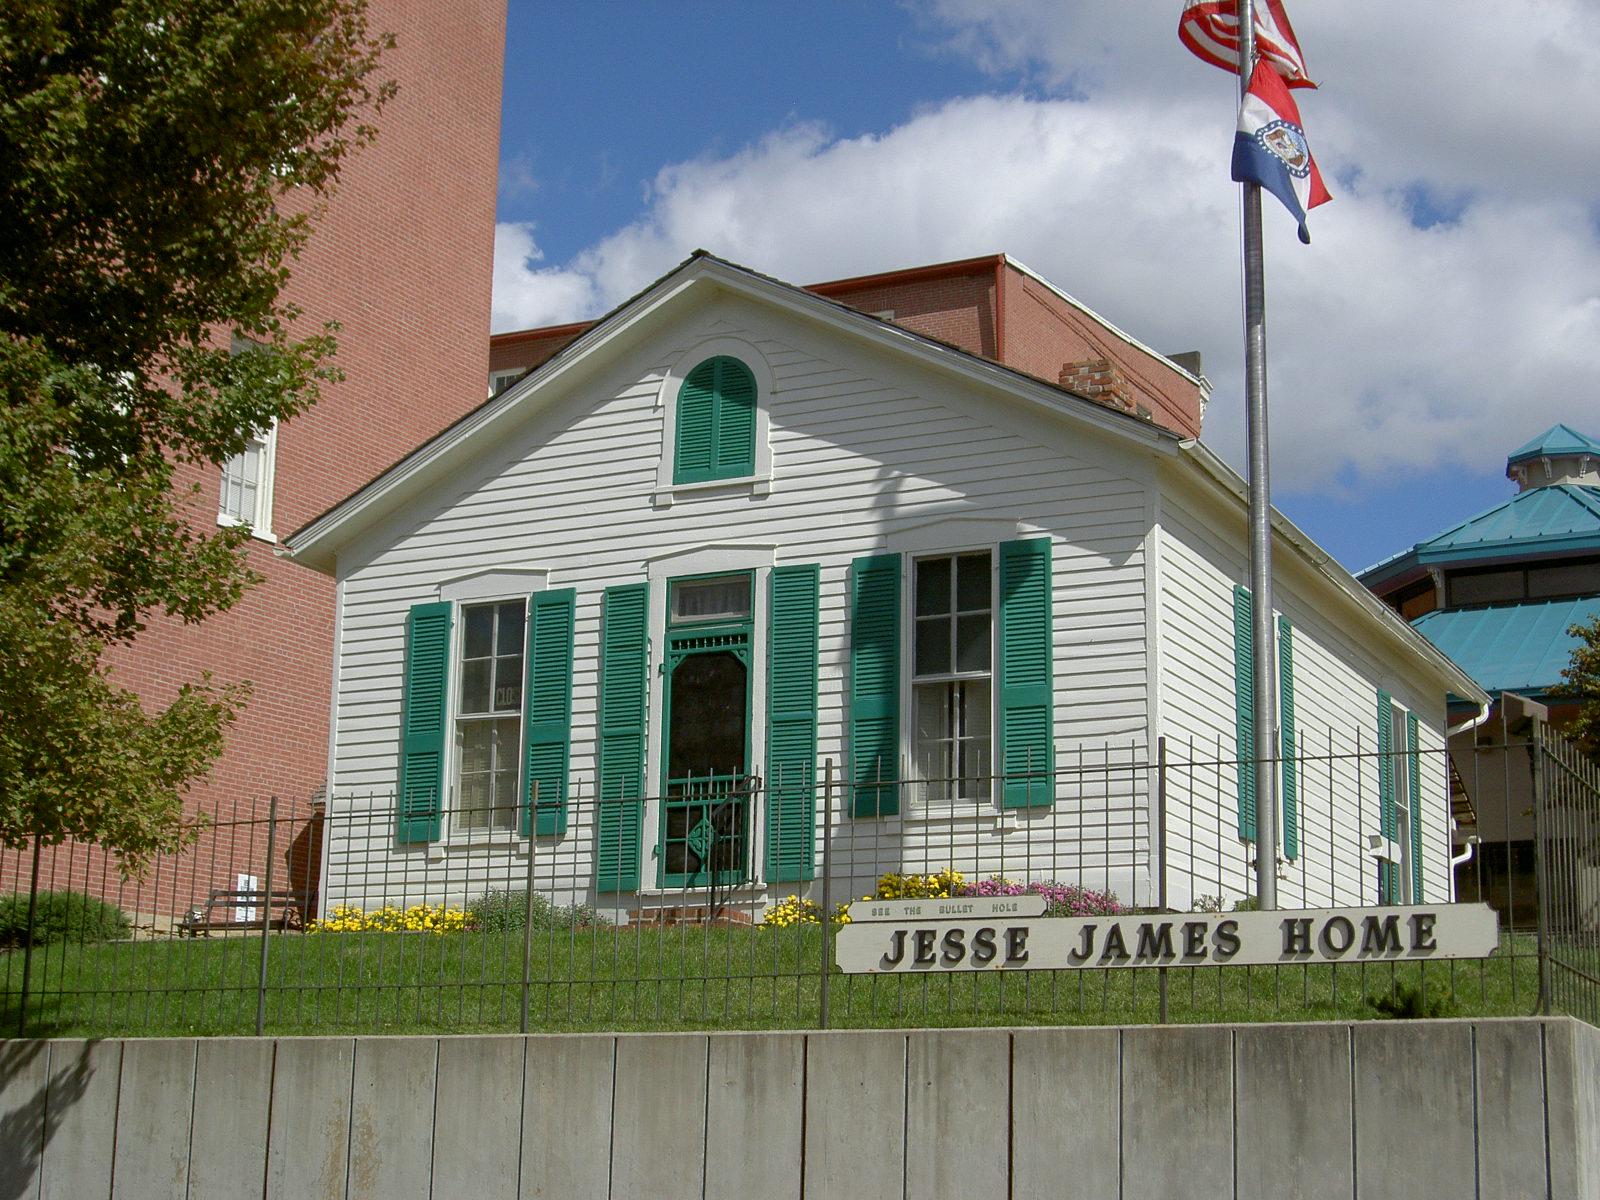 Jesse James House